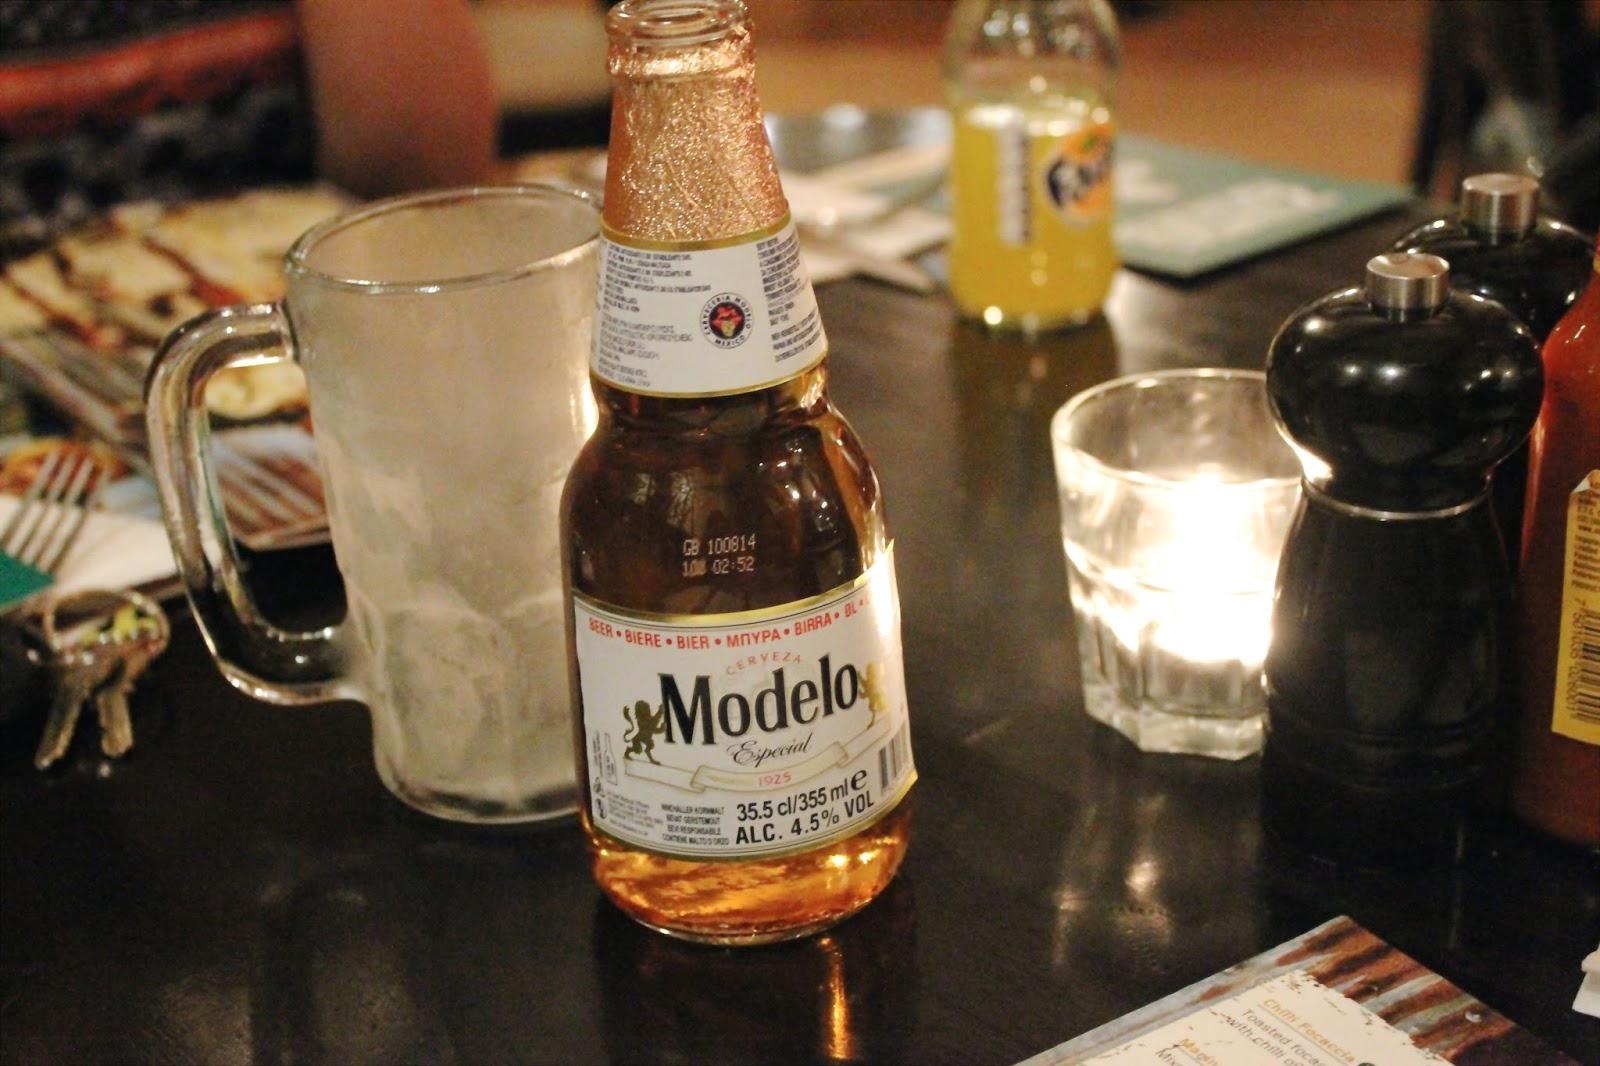 chimichanga review, chimichanga, chimichanga mk, chimichanga mk review, mexican mk, mexican restaurant mk